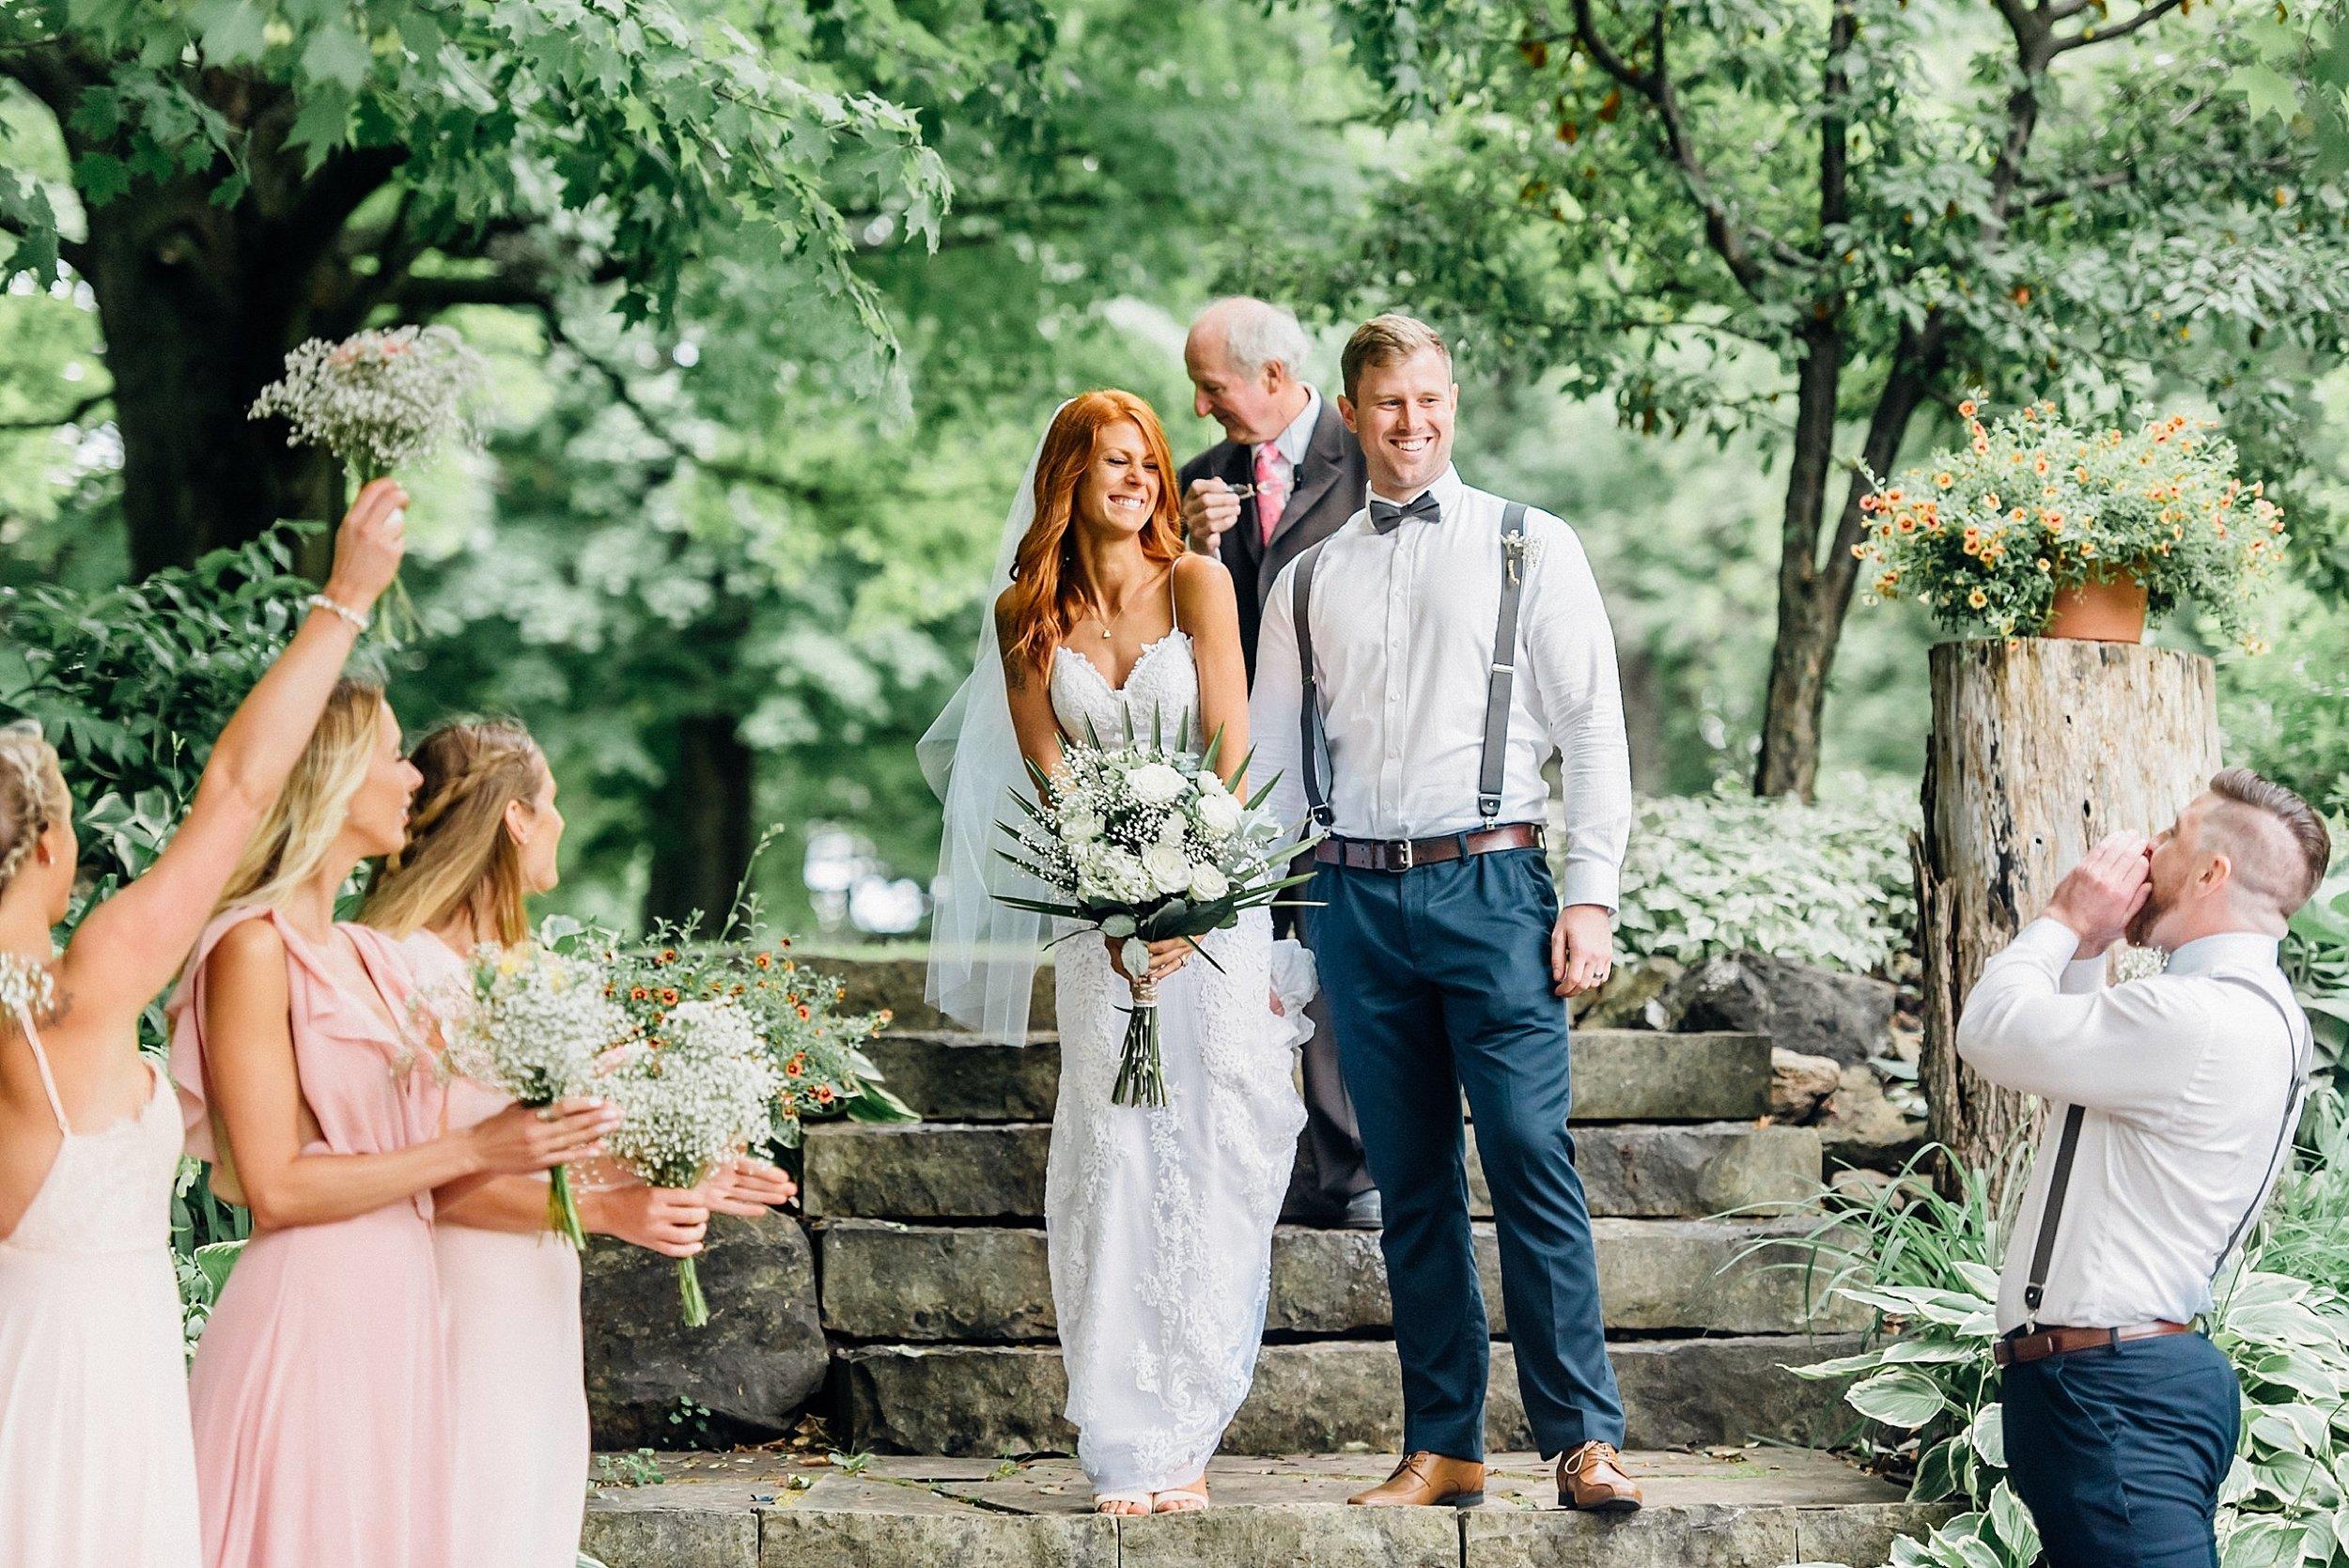 Ottawa Wedding Photographer - Stanley's Olde Maple Lane Barn Wedding - Ali & Batoul Photography_0037.jpg